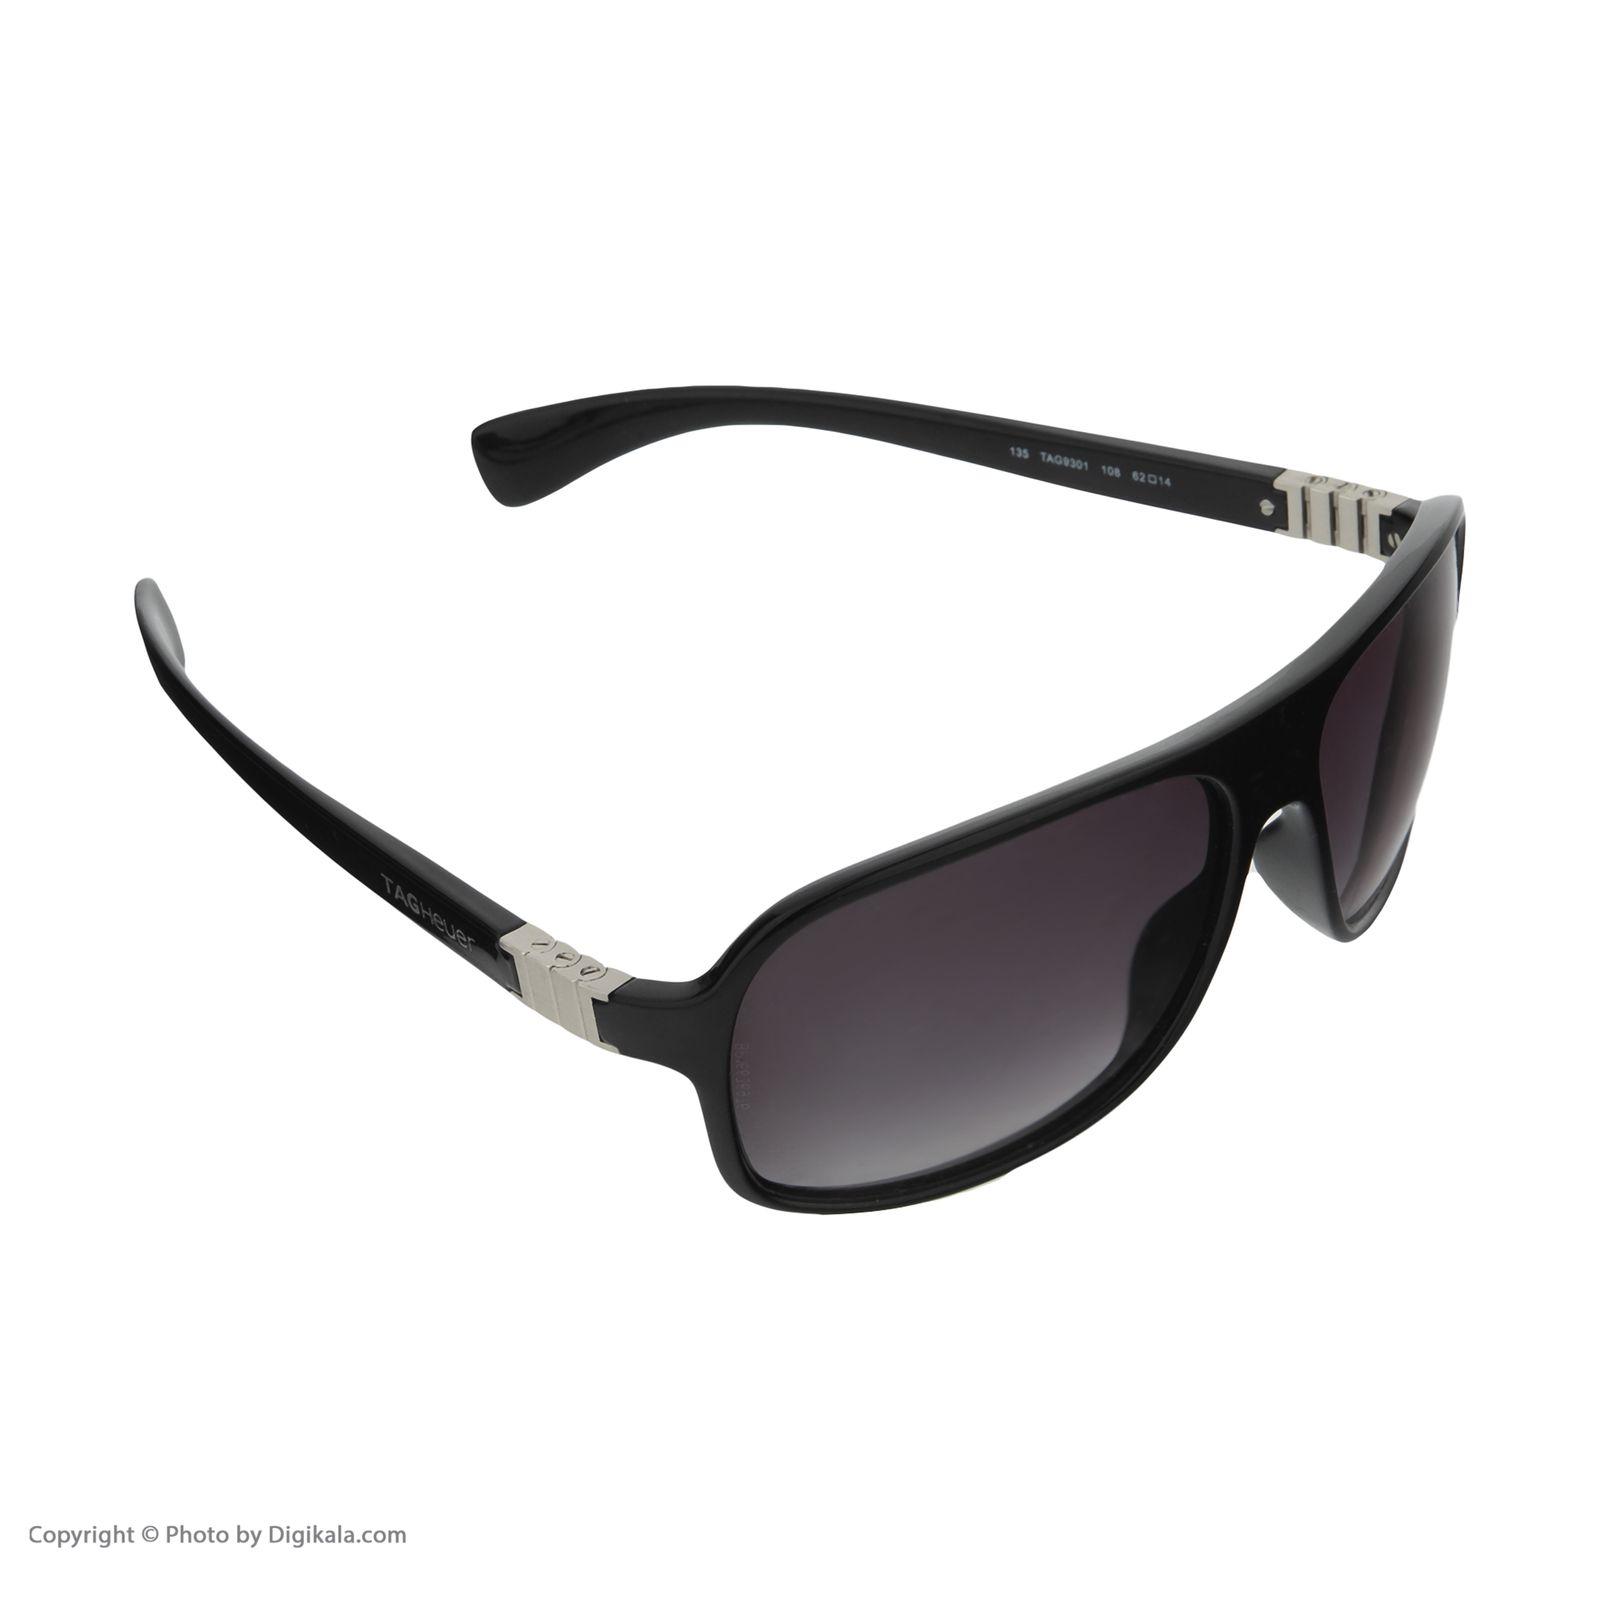 عینک آفتابی تگ هویر مدل 9301 -  - 4